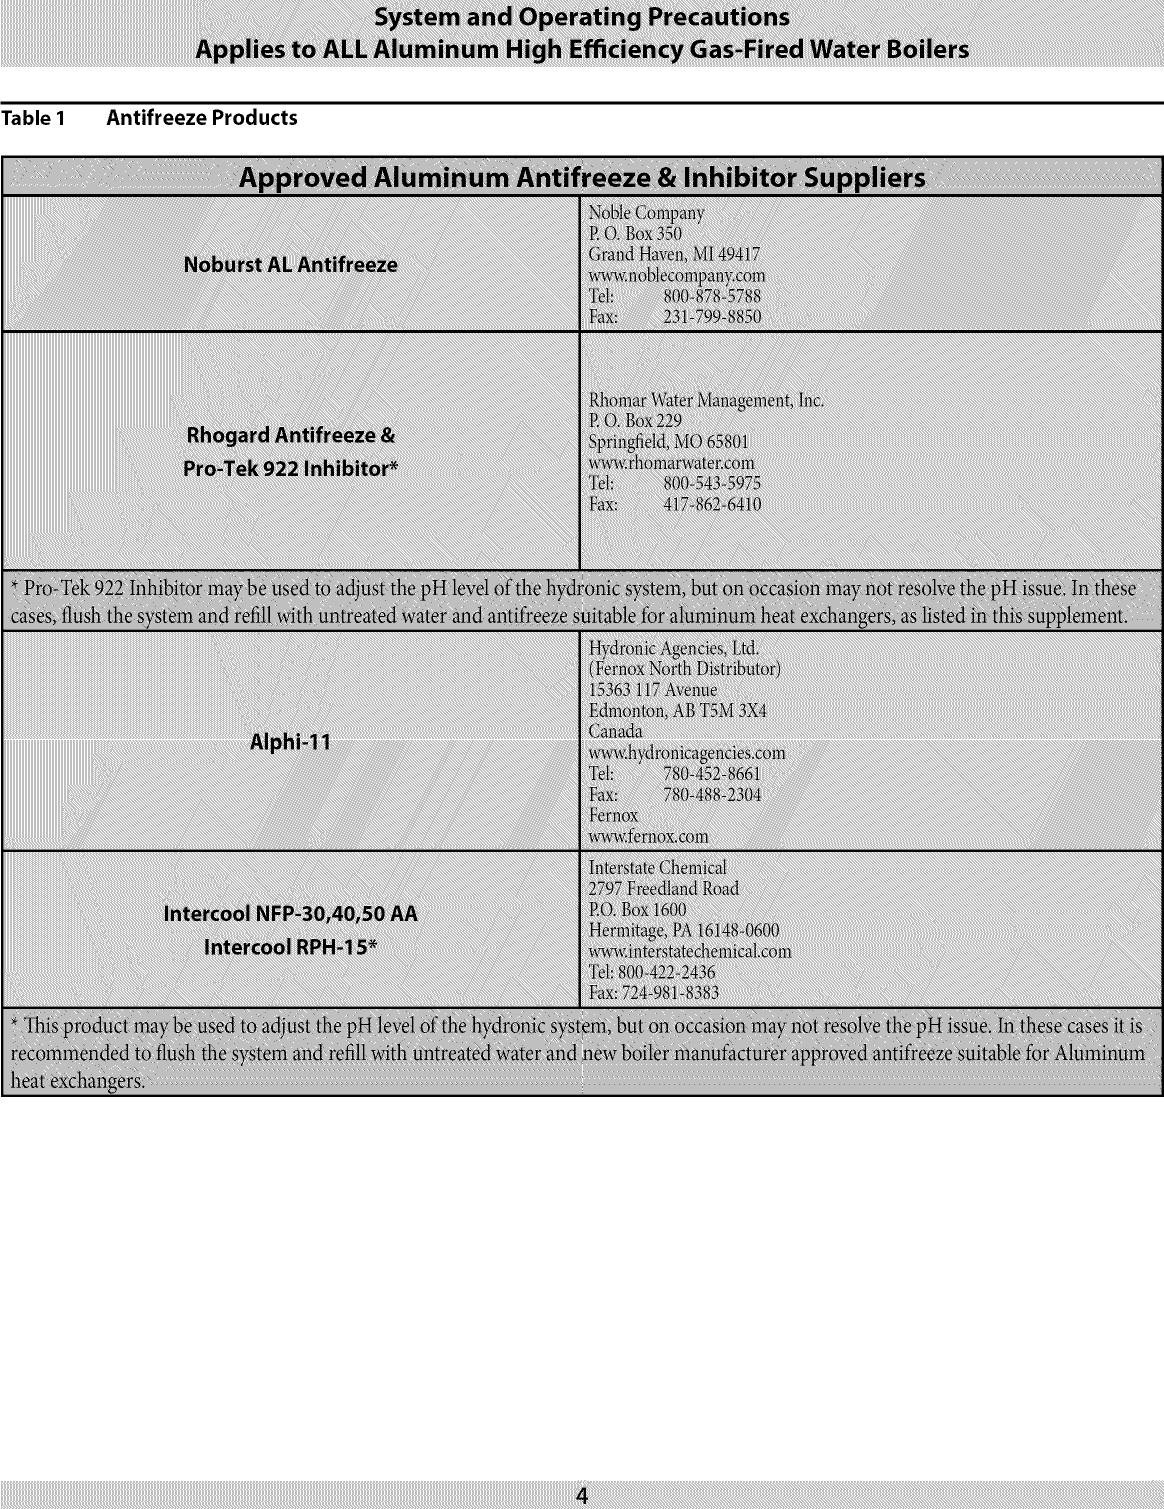 Dunkirk Boiler Manual L1001319 Wiring Diagram Page 4 Of